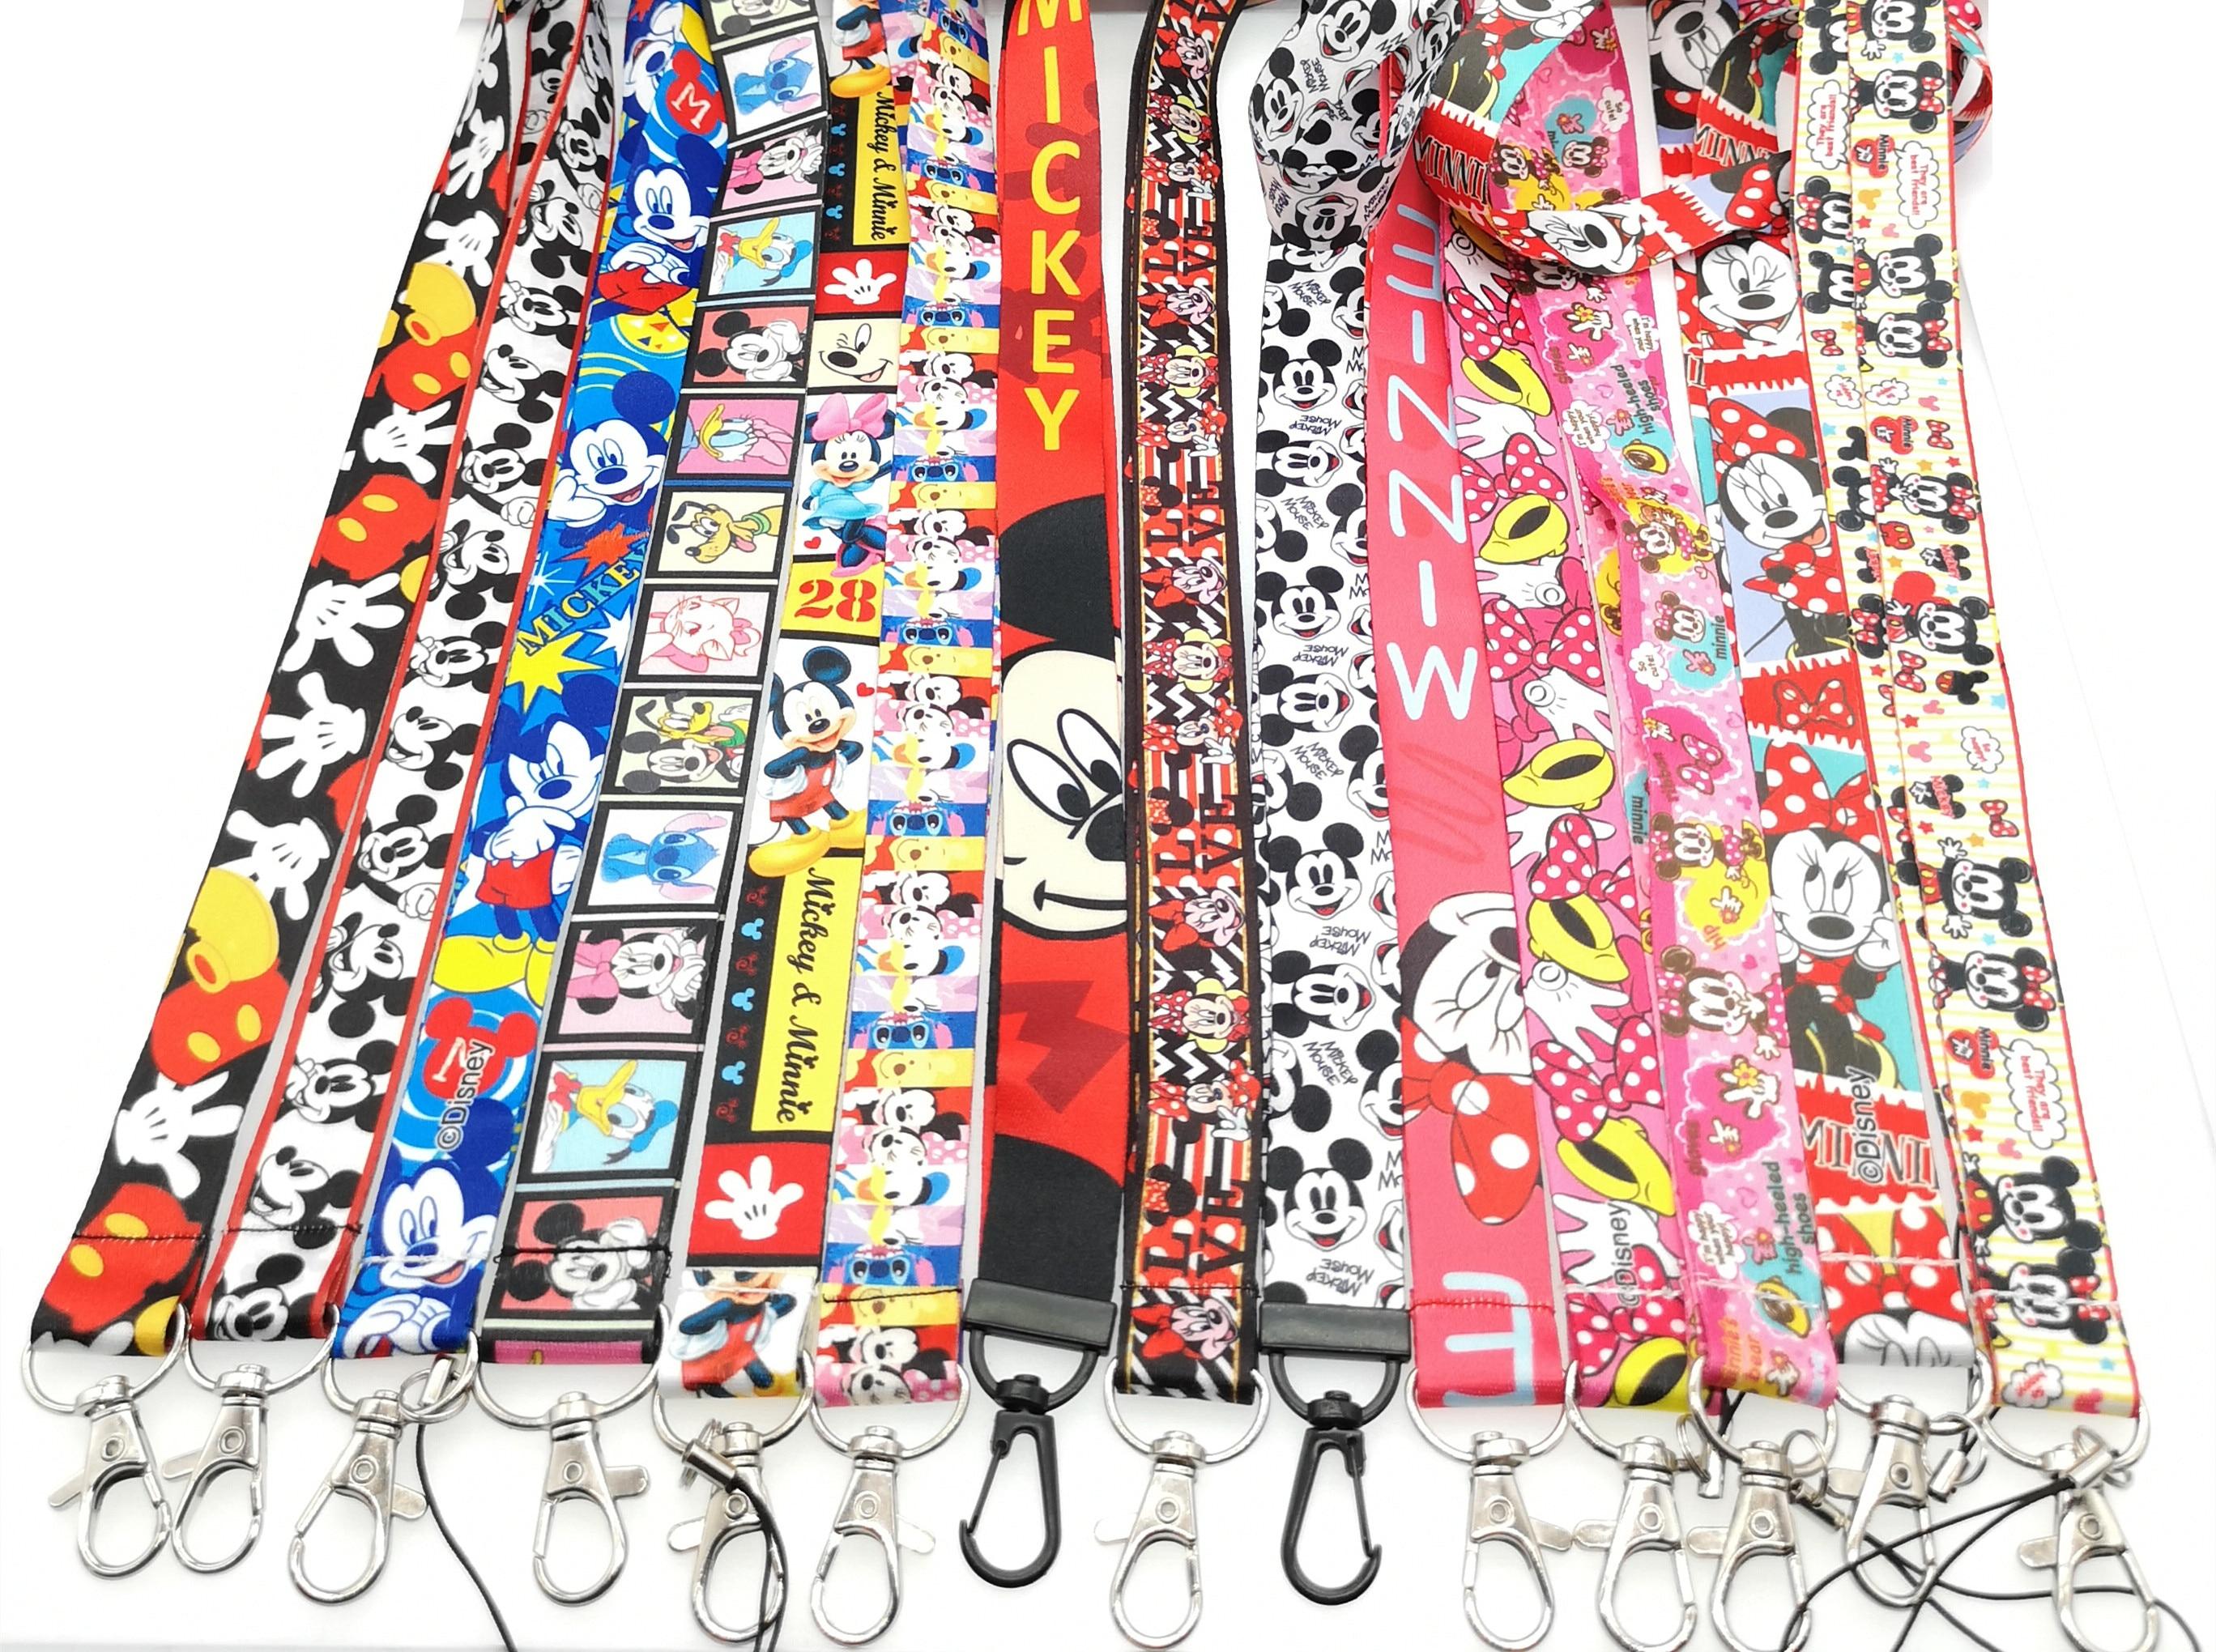 10pcs/20pcs/50pcs/100pcs Cartoon Mickey Minnie Color Mix Lanyard Neck Strap Lanyard Mobile Phone Key Chain ID Badge Key Chains